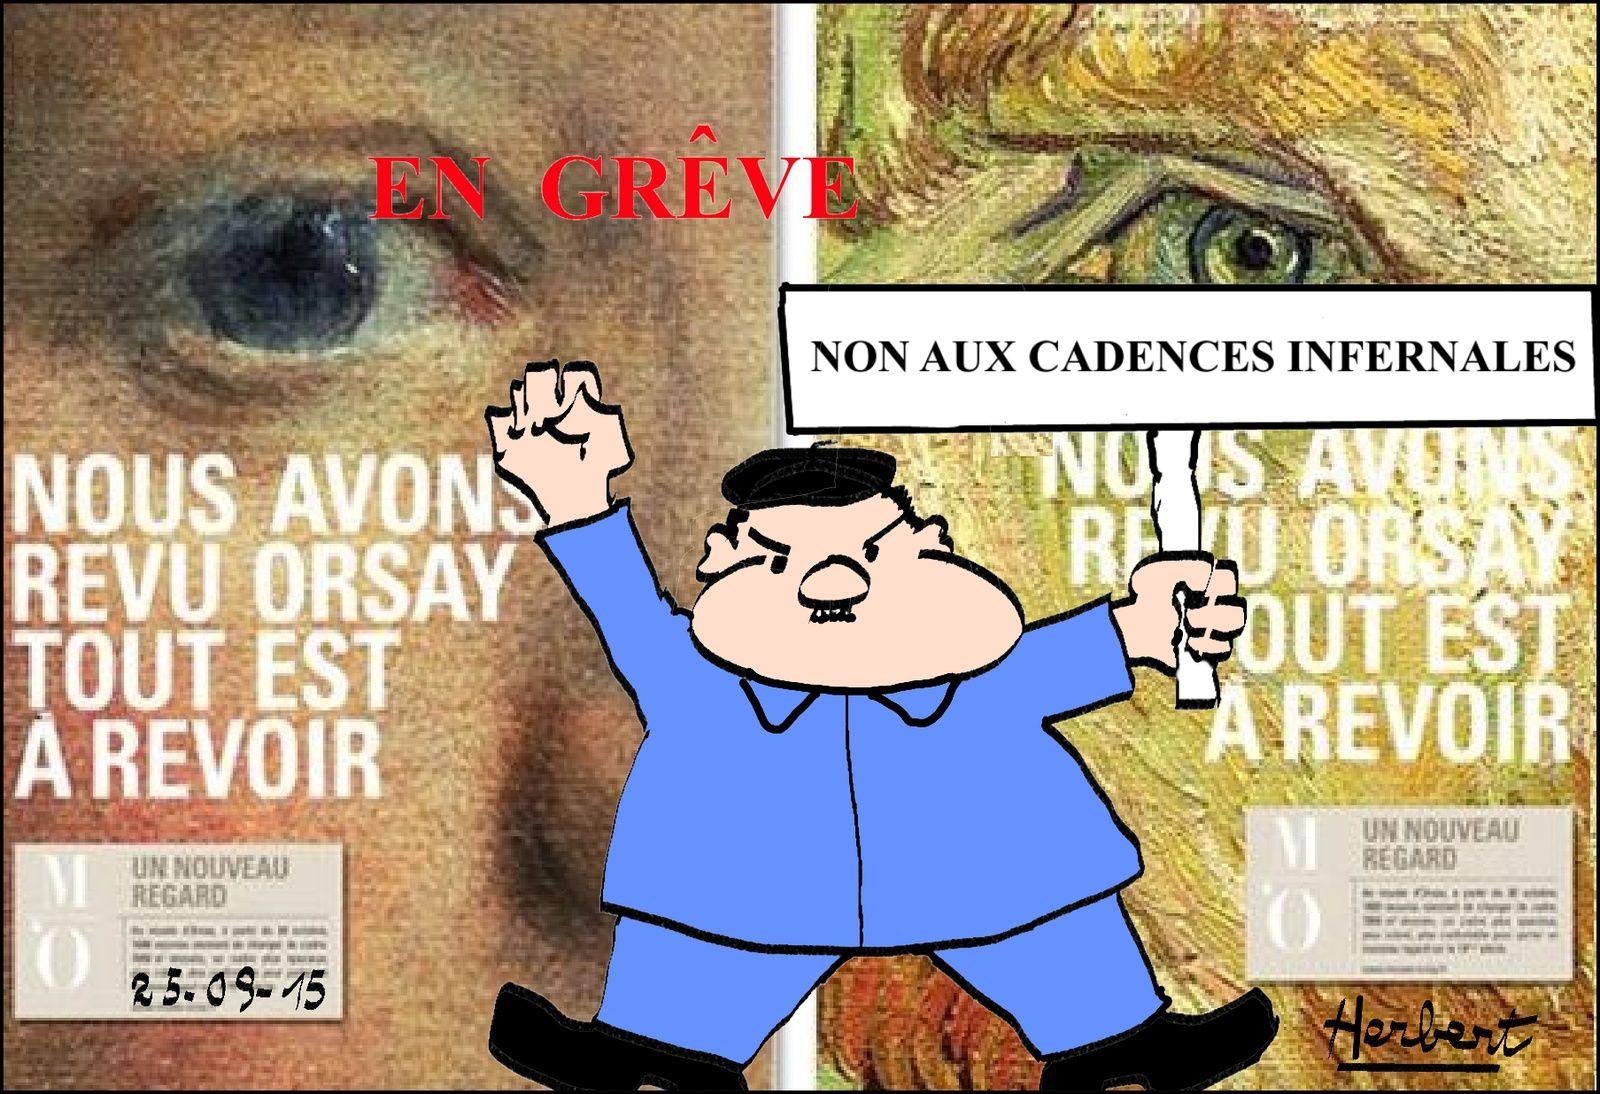 Grêve au Musée d'Orsay